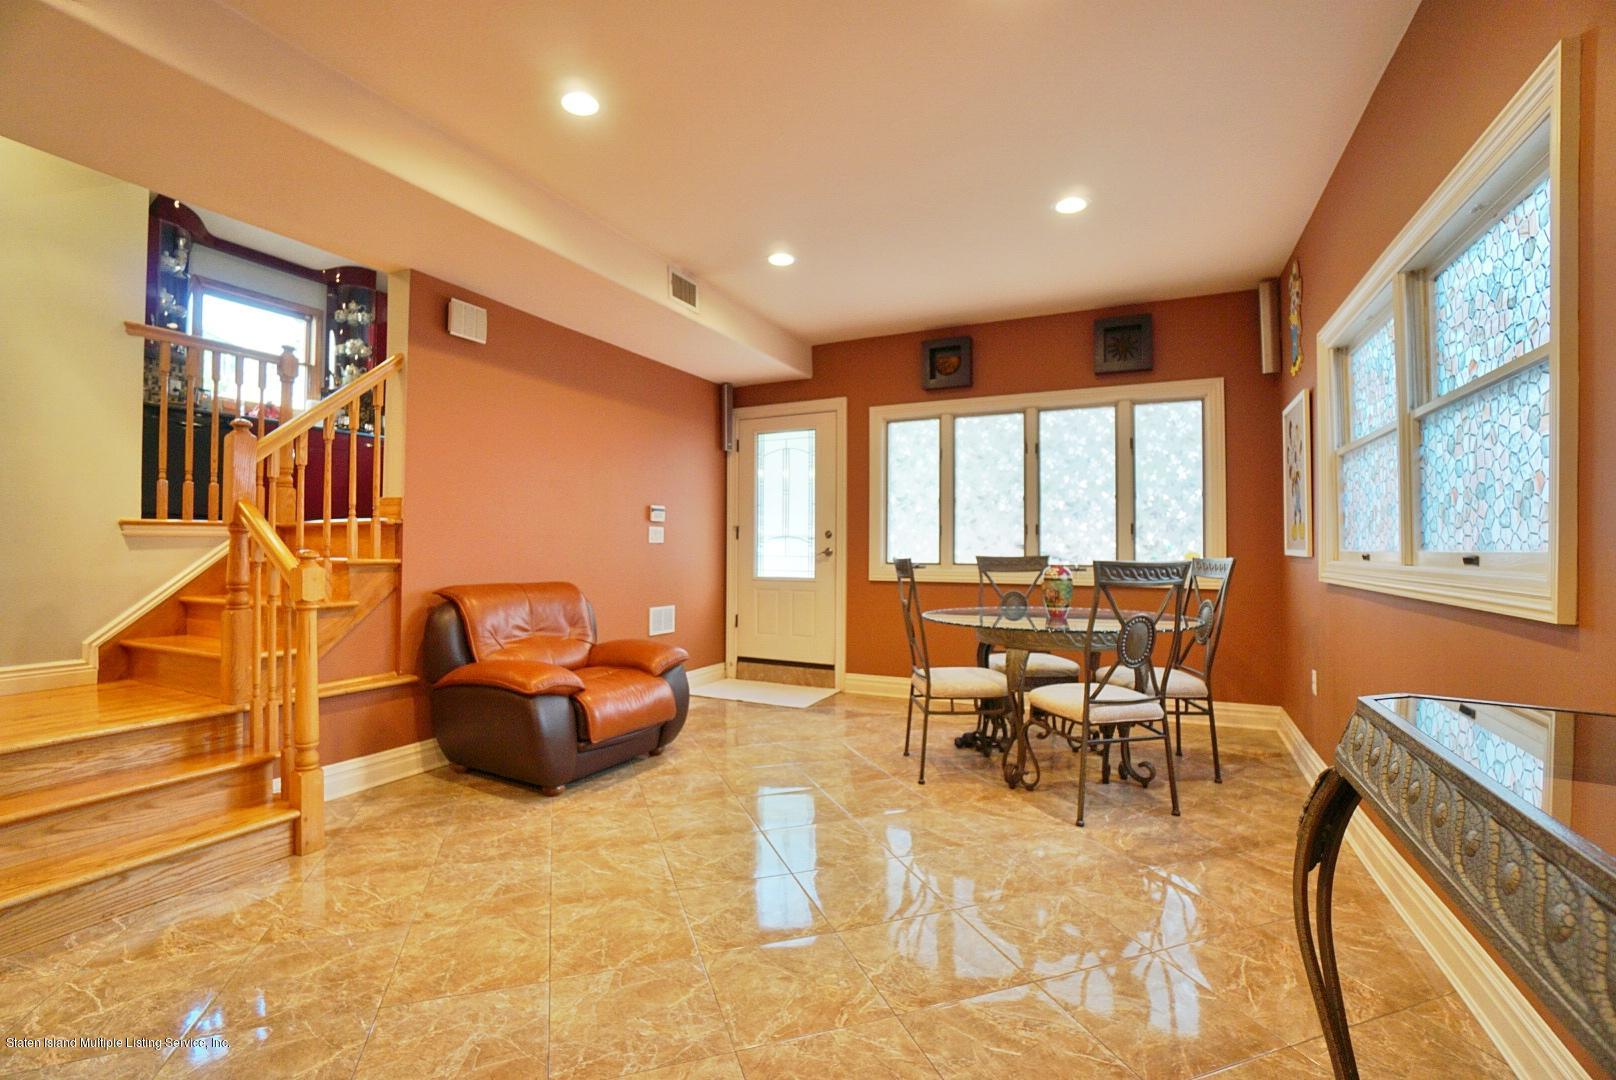 Single Family - Detached 48 Ocean Terrace  Staten Island, NY 10314, MLS-1130826-31